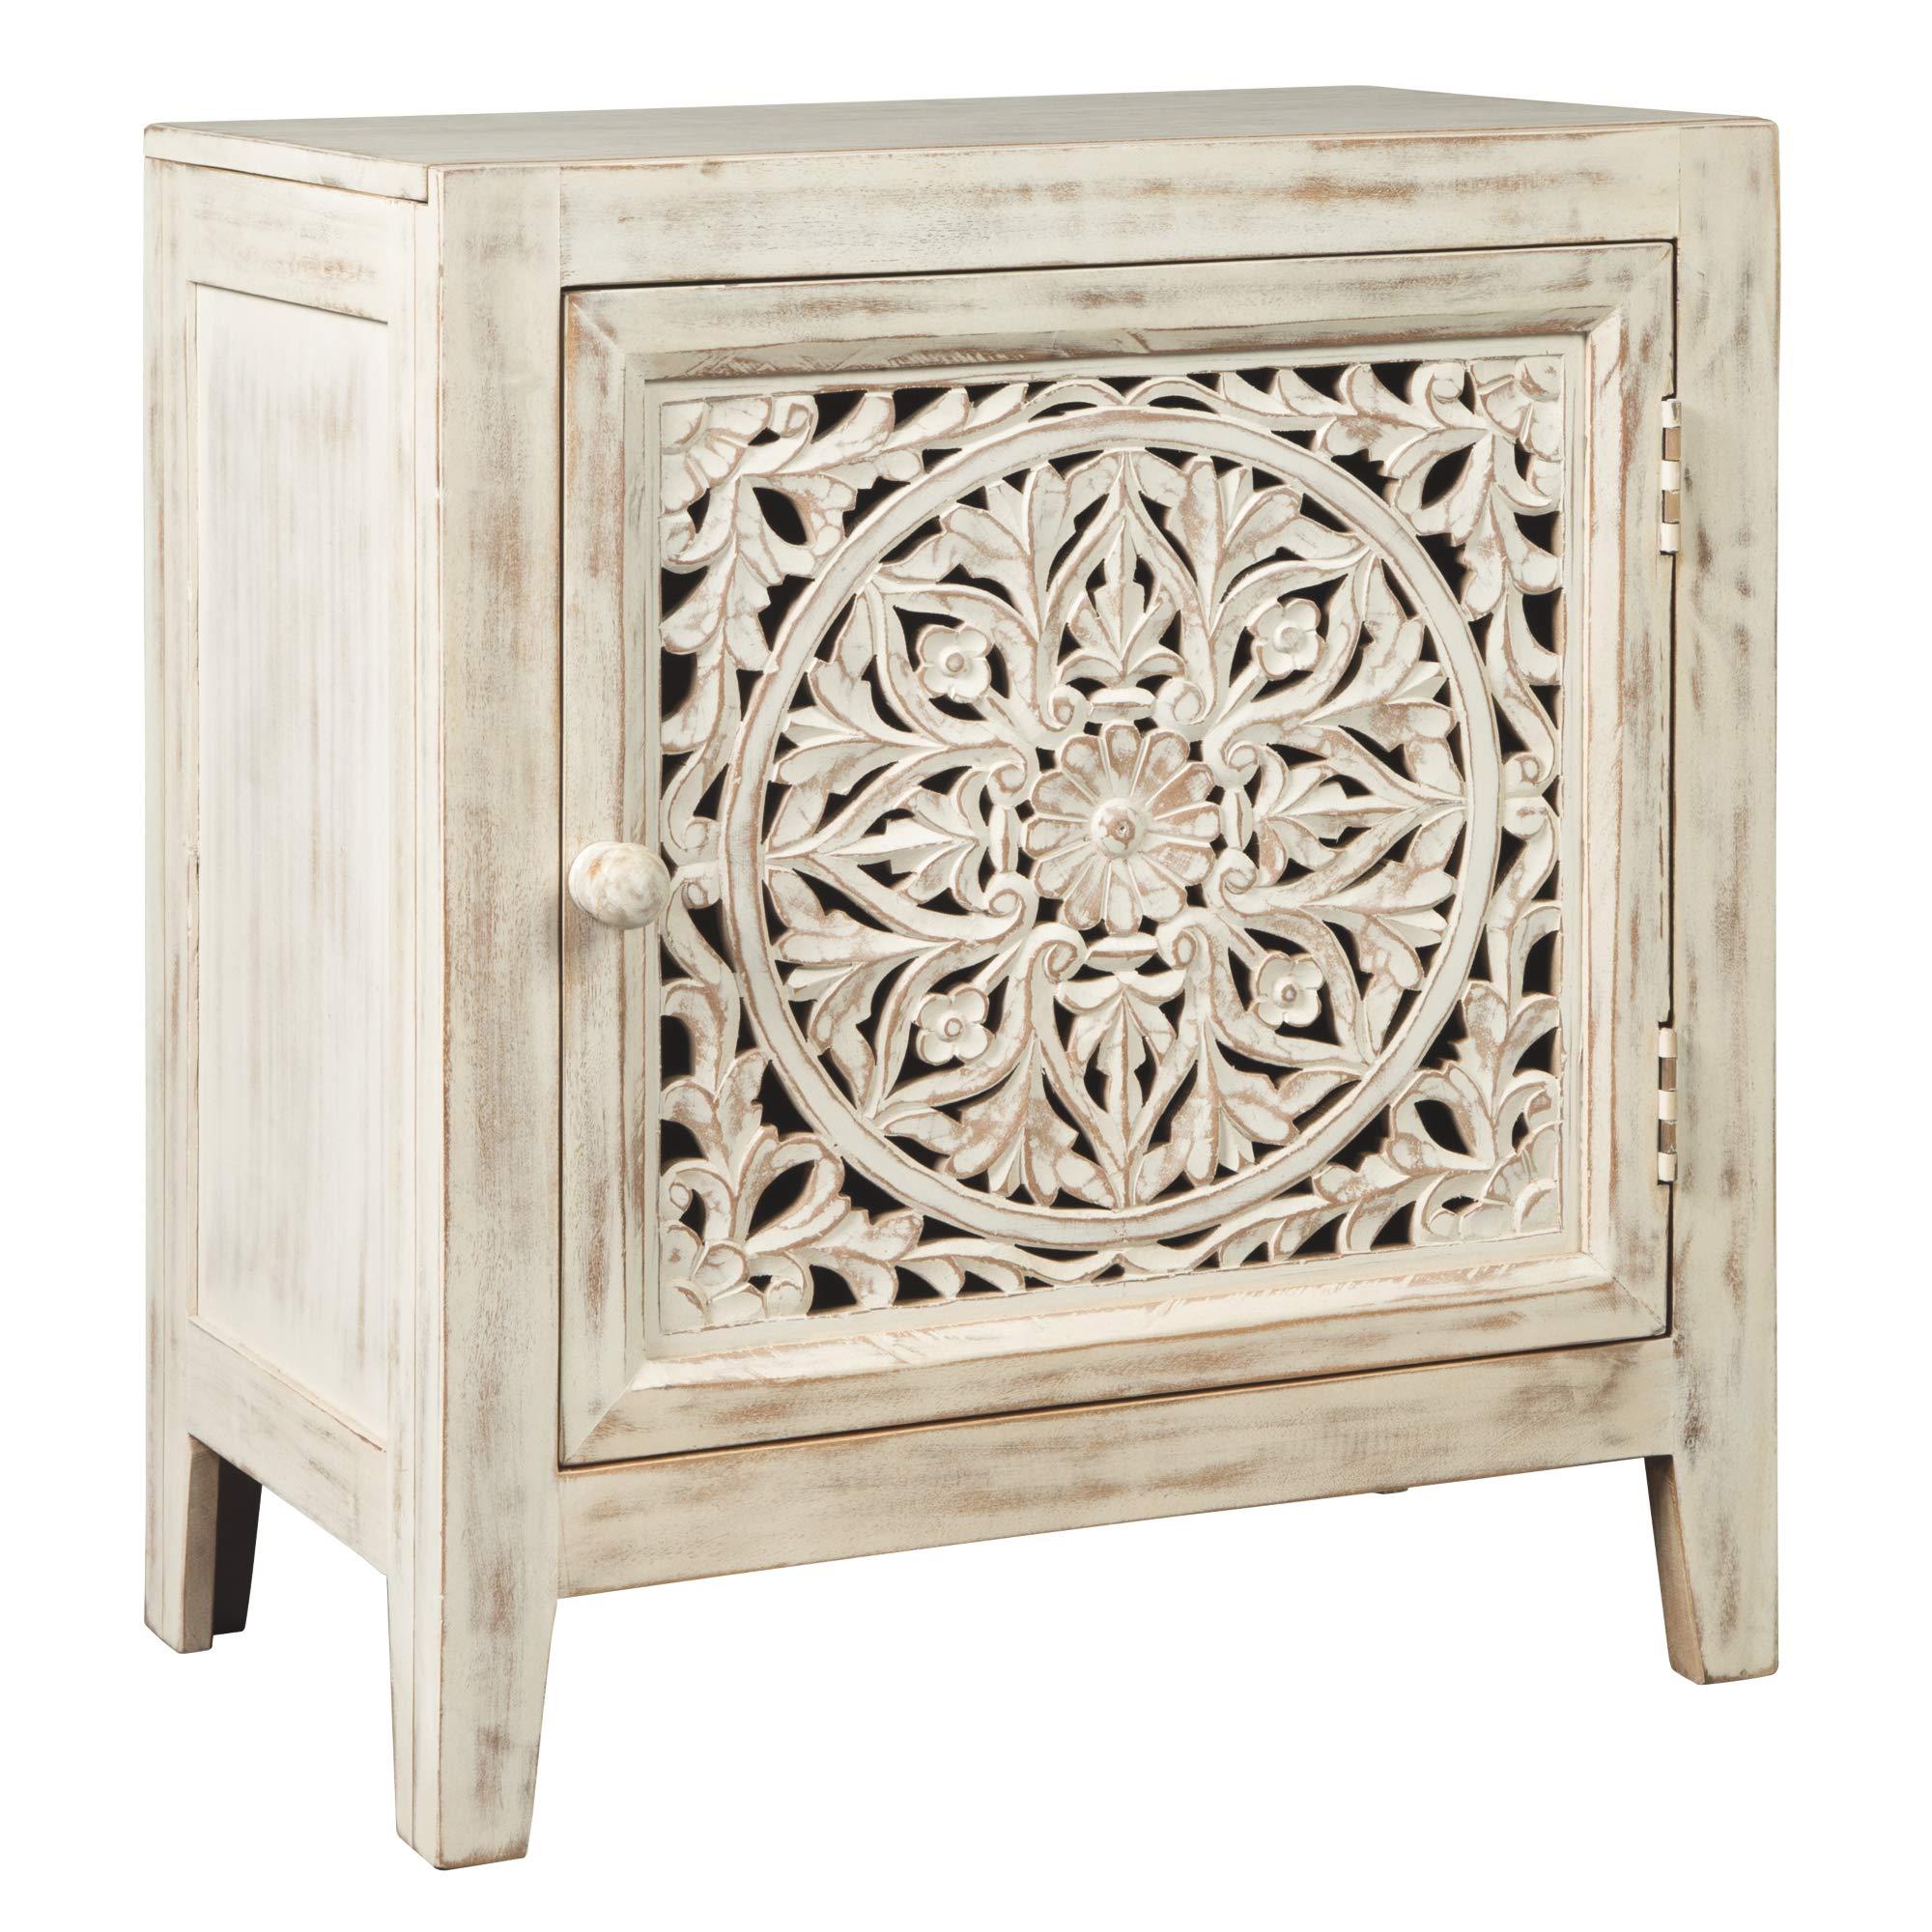 Ashley Furniture Signature Design - Fossil Ridge Accent Cabinet - White by Signature Design by Ashley